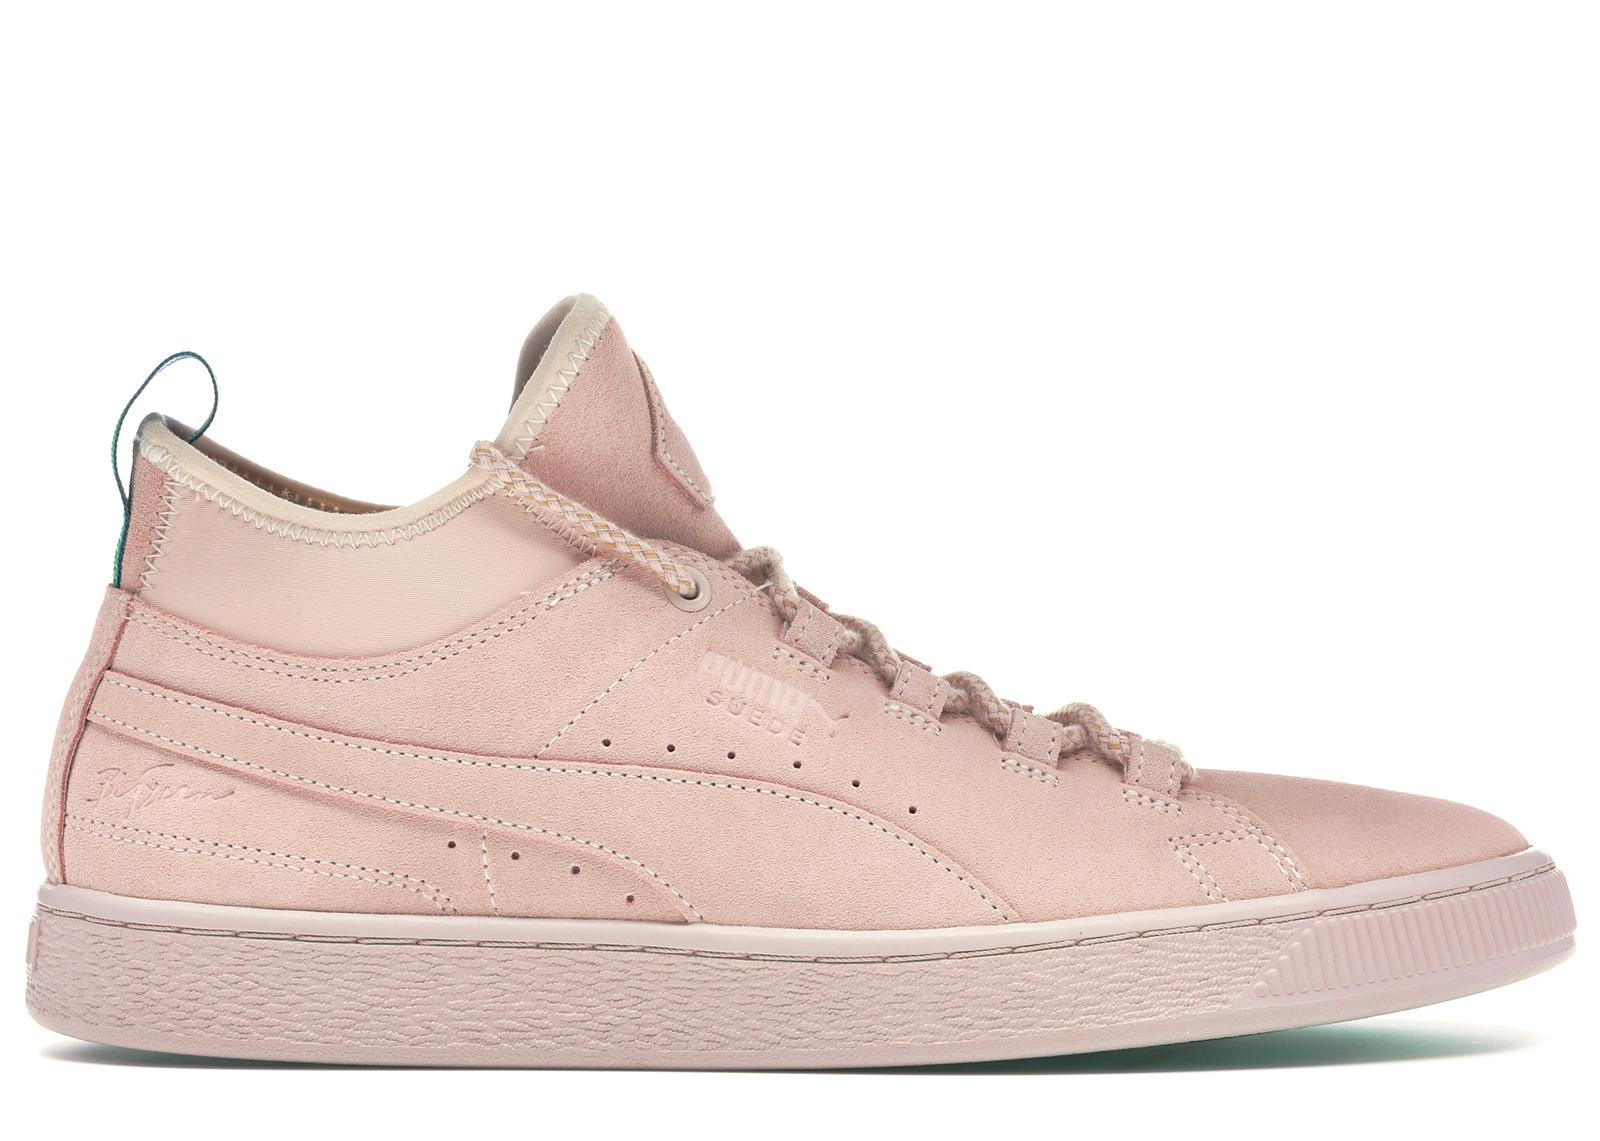 Puma Buy 15 Size Shoesamp; Deadstock Sneakers hCsxBQrtd